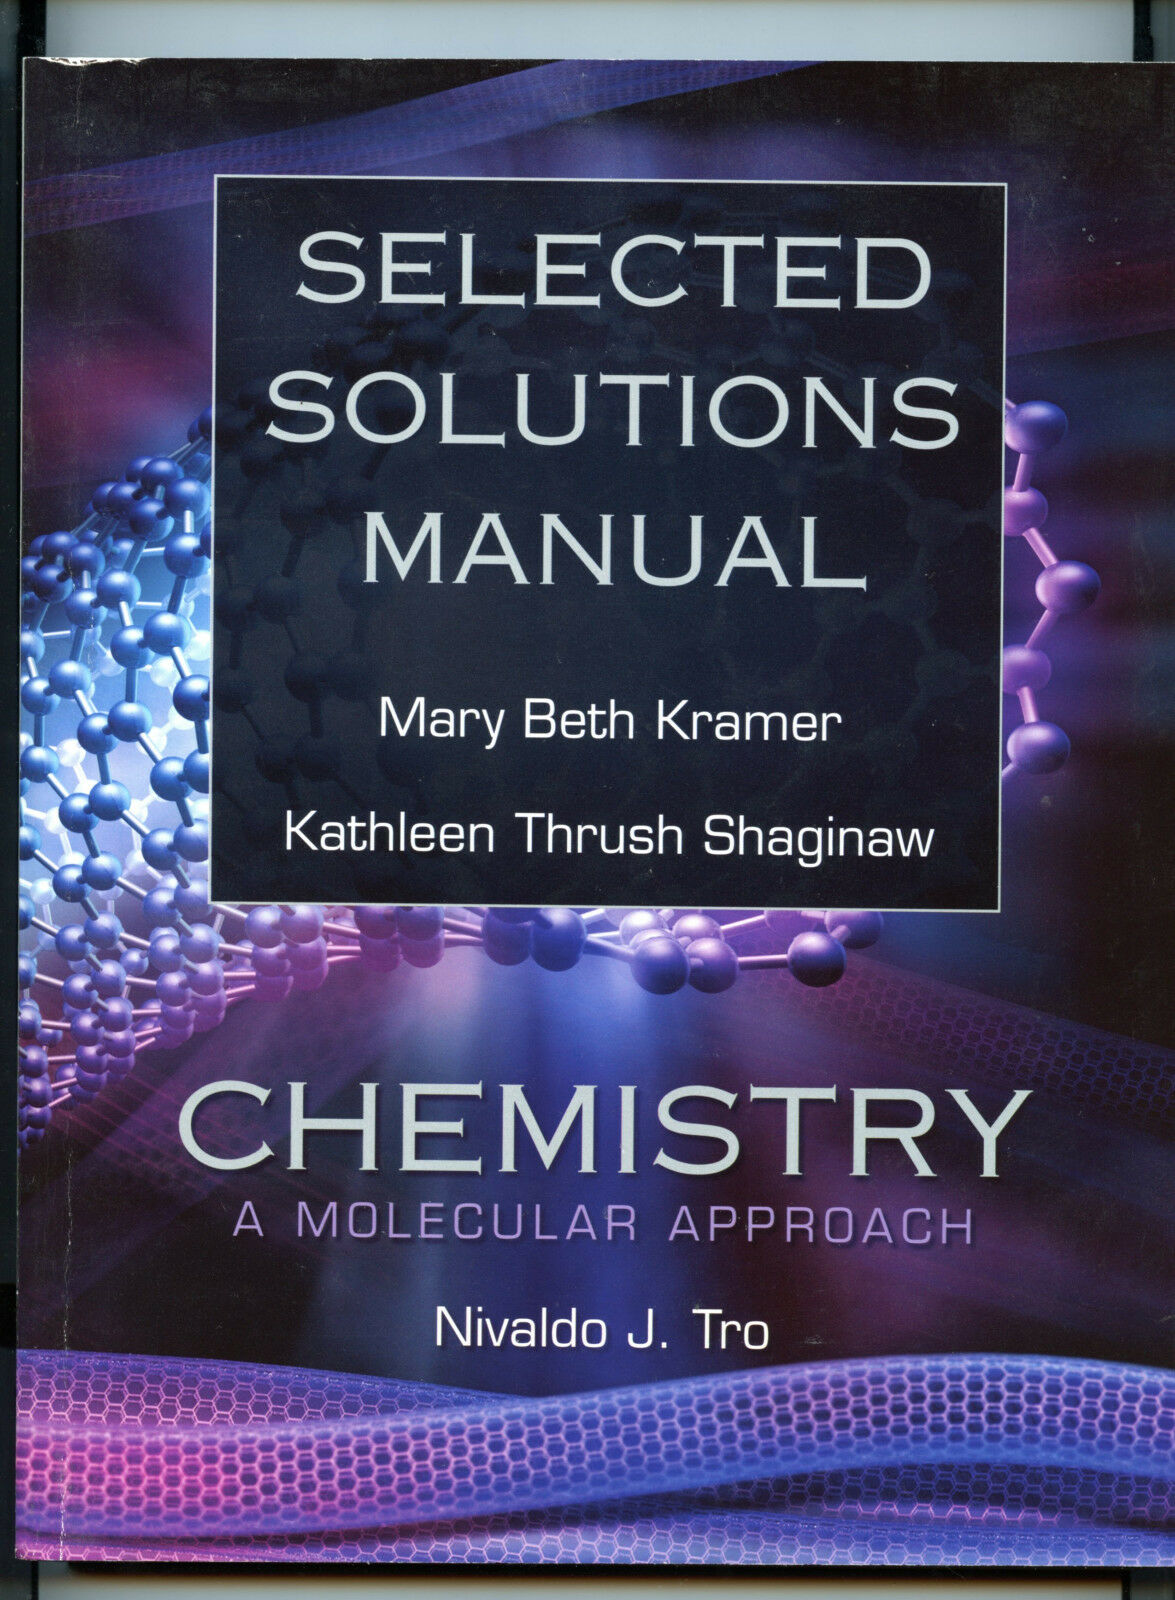 Chemistry : A Molecular Approach by Mary Beth Kramer, Nivaldo J. Tro and  Kathy J. Thrush Shaginaw (2007, Paperback, Student Manual) | eBay